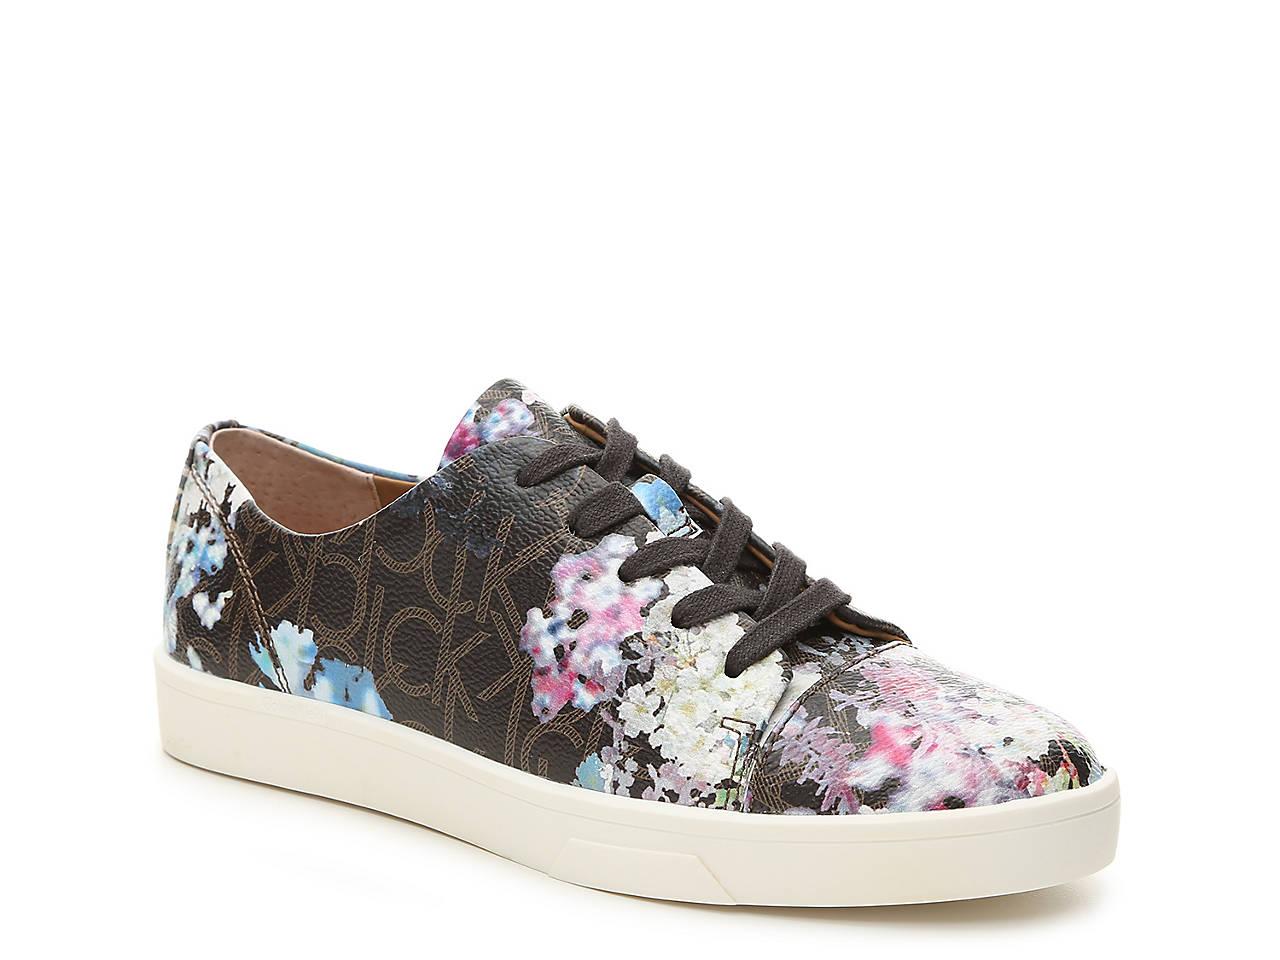 5eed35b6ea8c Calvin Klein Imilia Sneaker Women s Shoes